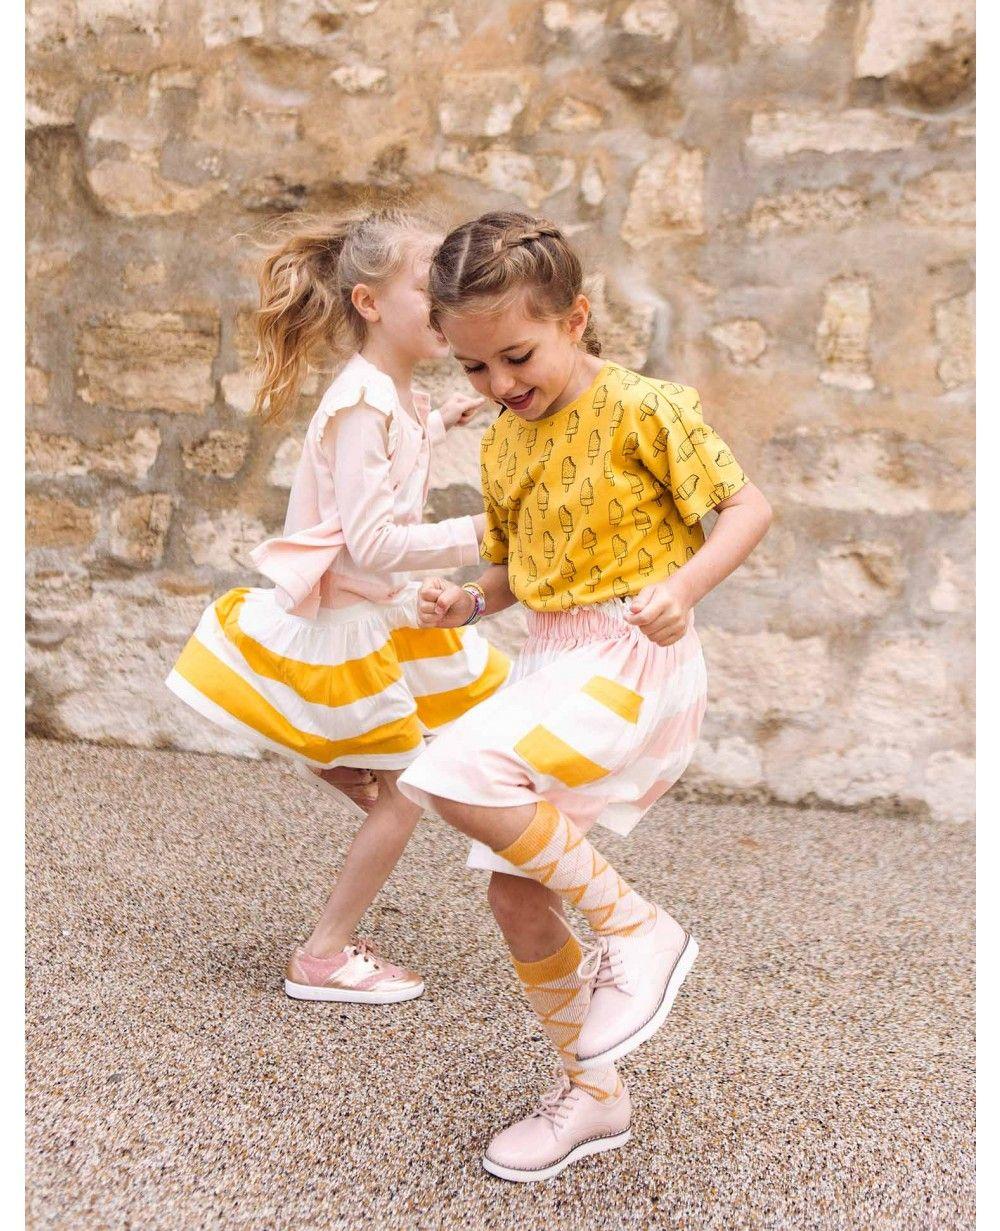 Kinderkleding Webshop.Bi Gout Skirt Blune Online Baby Kids Teens Kinderkleding